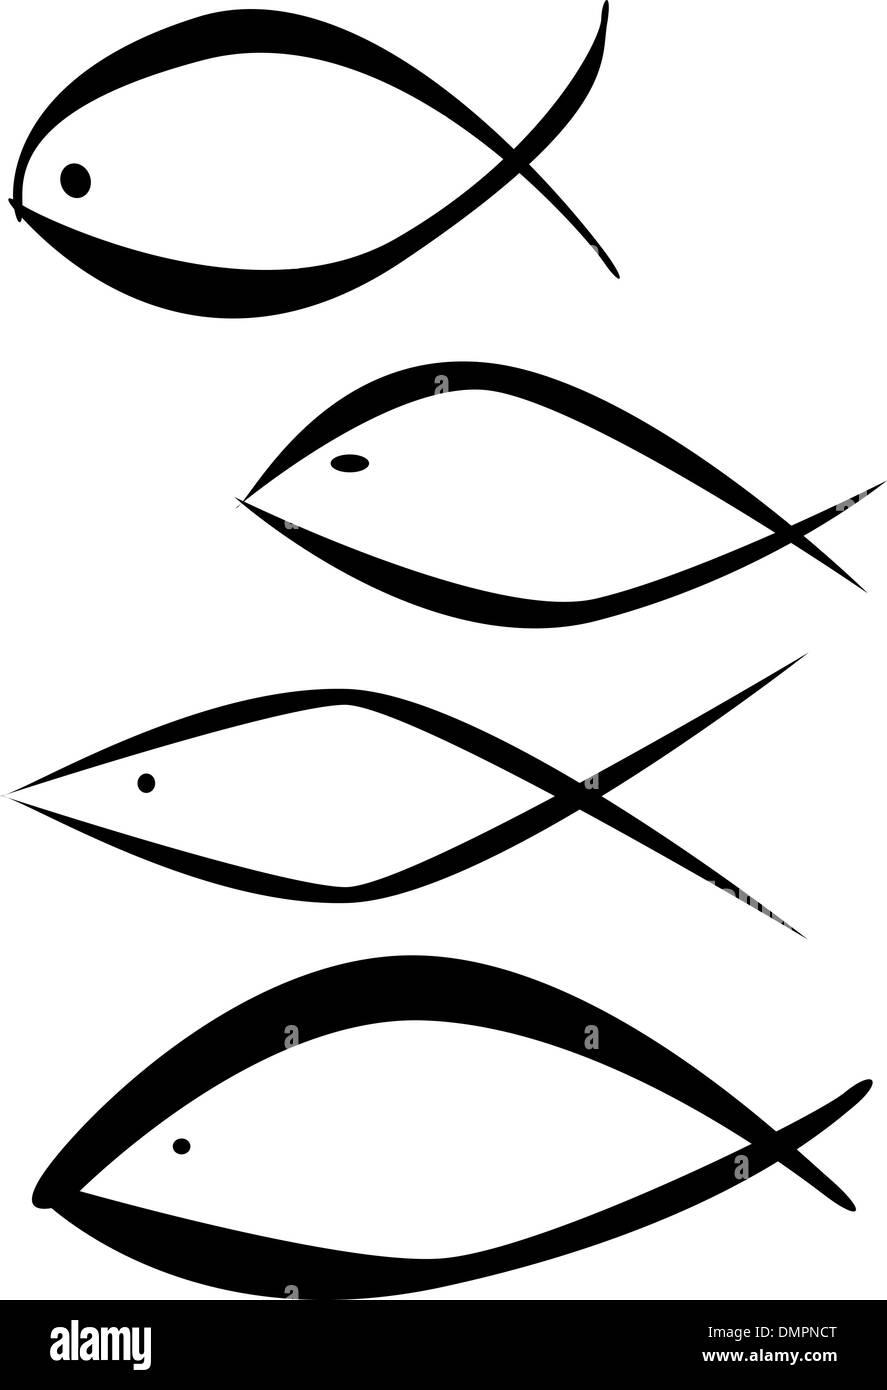 Christian Fish Symbol Icon Isolated Stock Photos Christian Fish